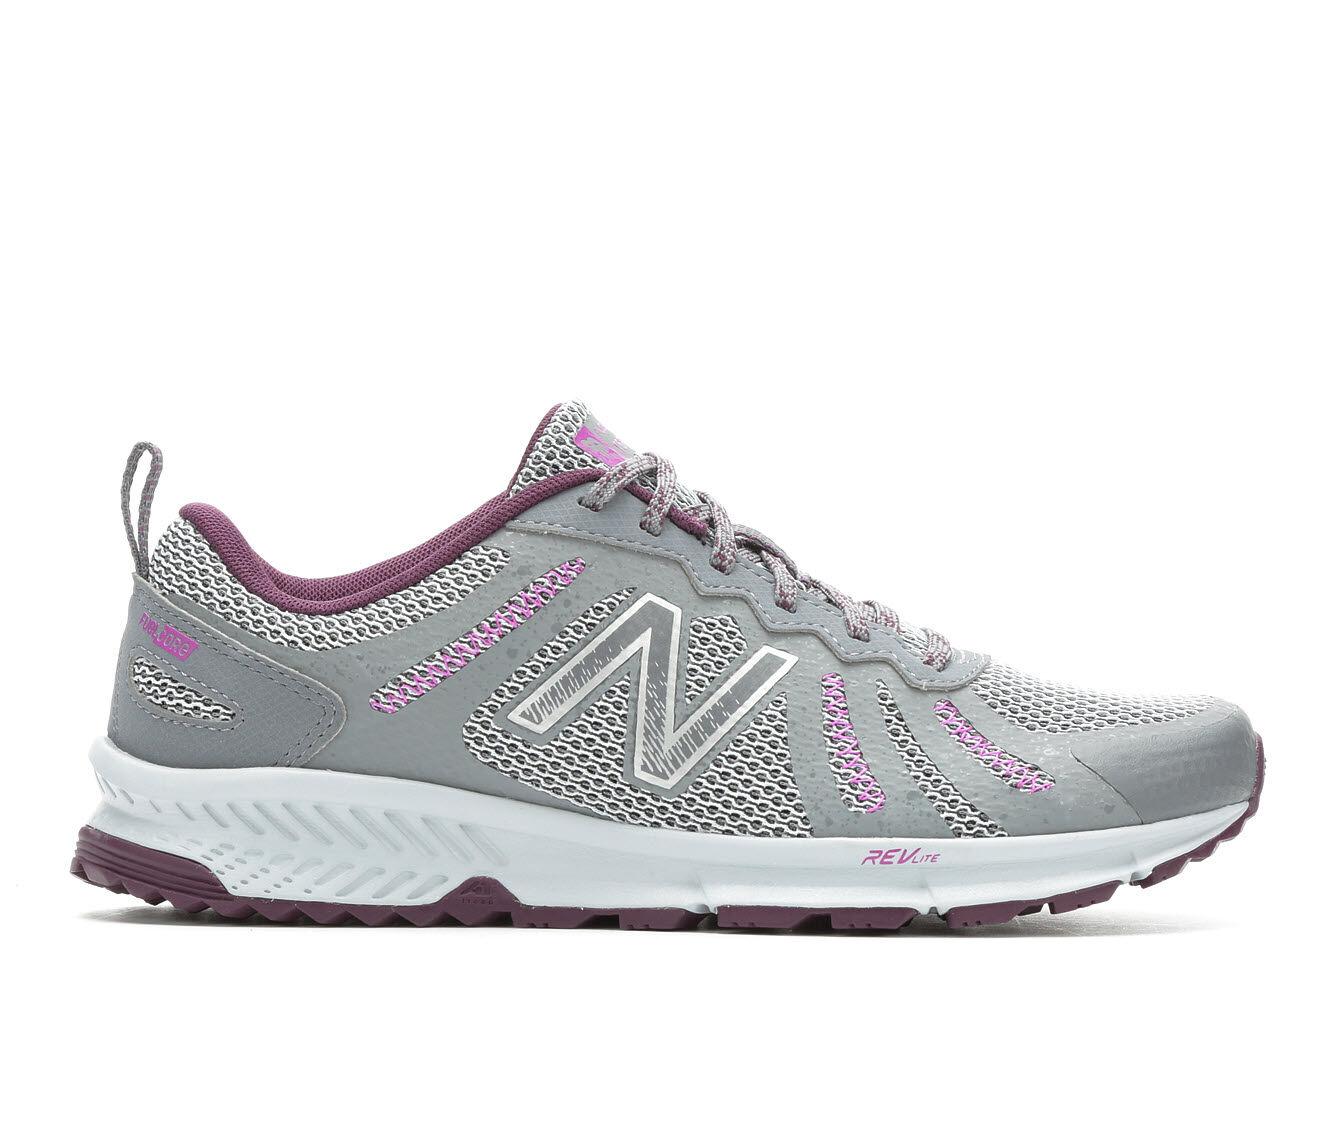 Women's New Balance WT590v4 Sneakers Grey/Purple